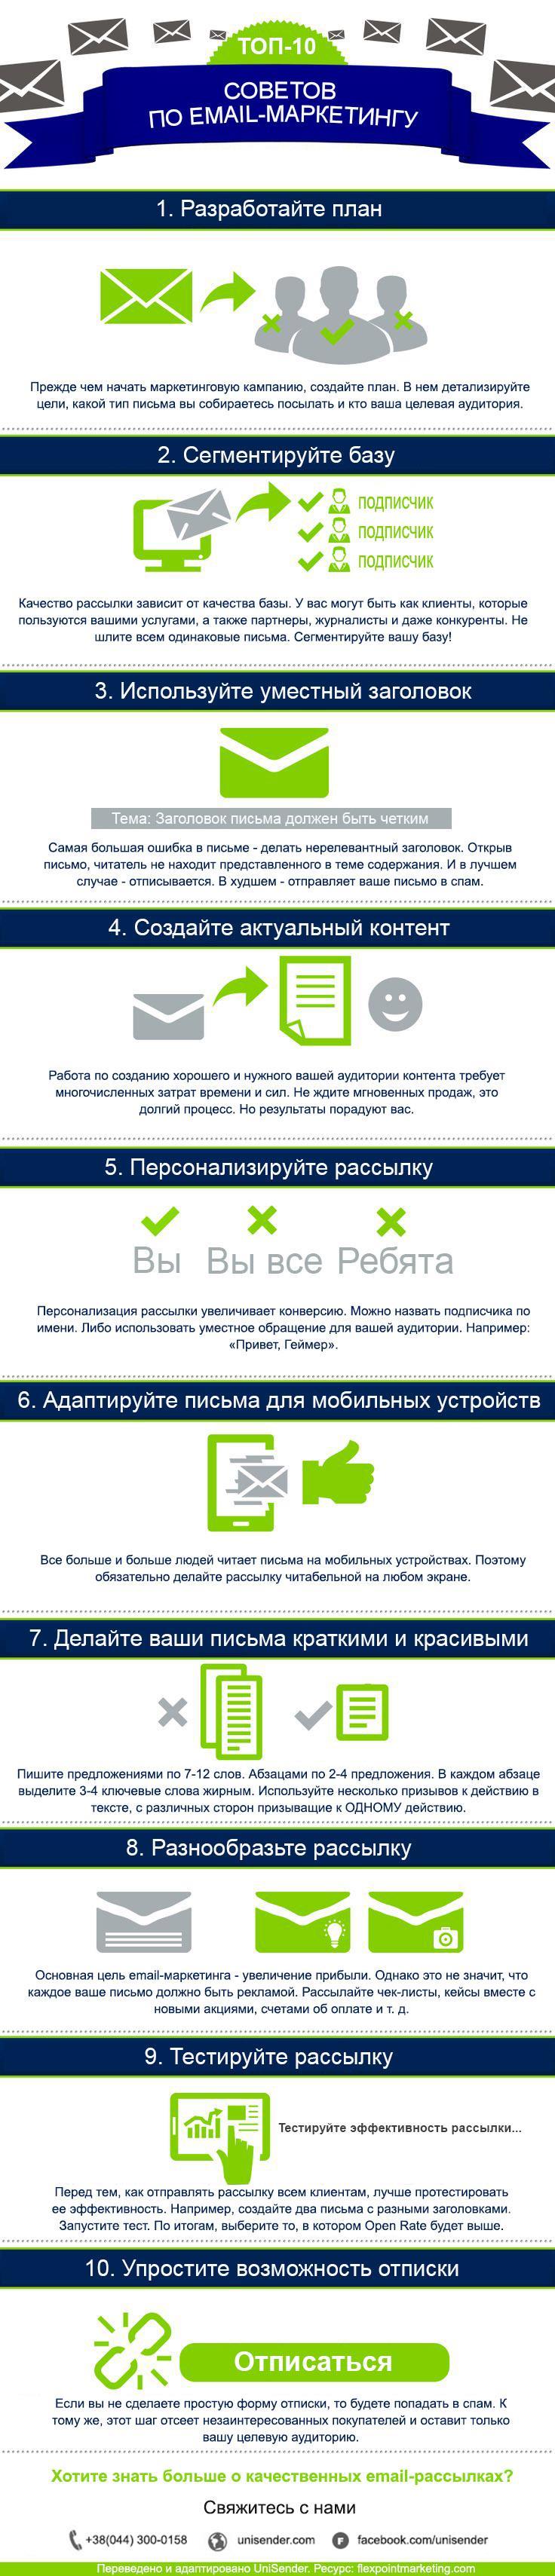 фото: Инфографика-инструкция по email-маркетингу UniSender